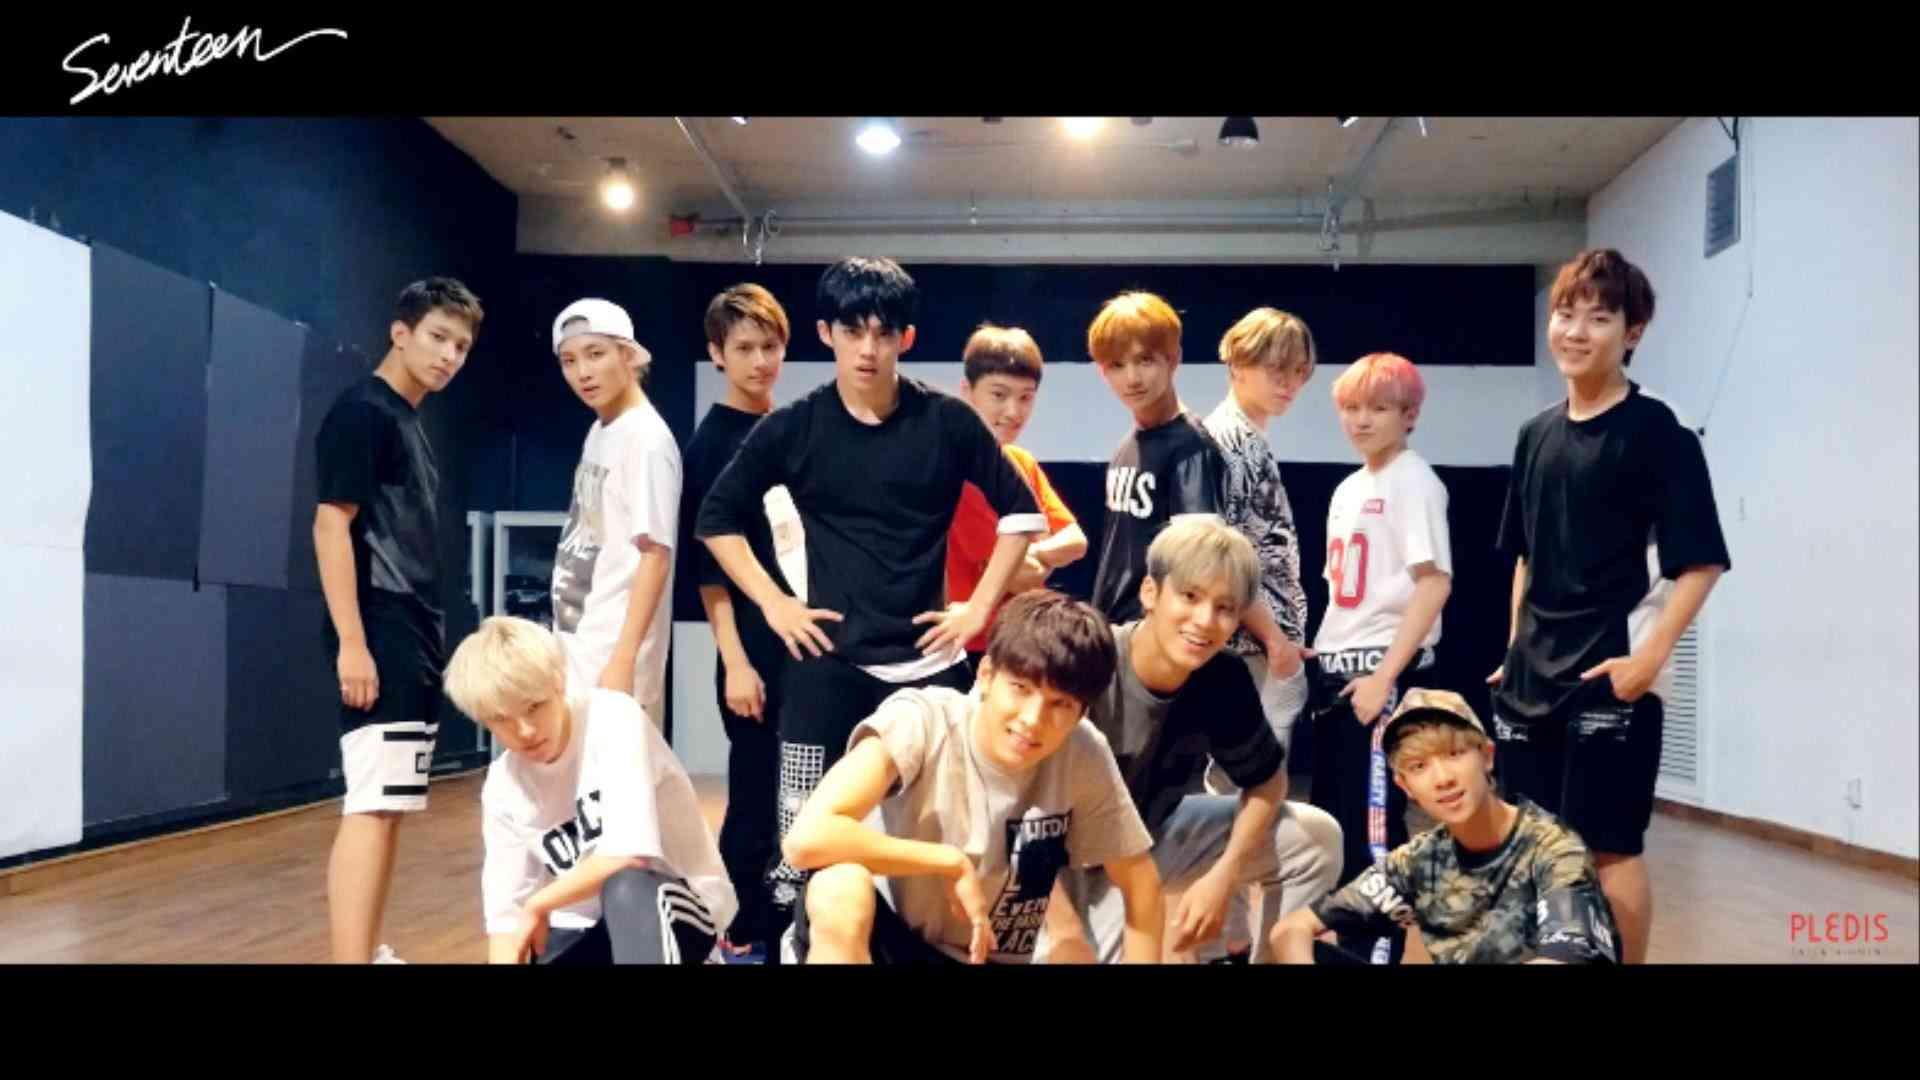 [Dance Practice] SEVENTEEN(세븐틴) - 만세(MANSAE) - FOLLOW ME Ver. - YouTube